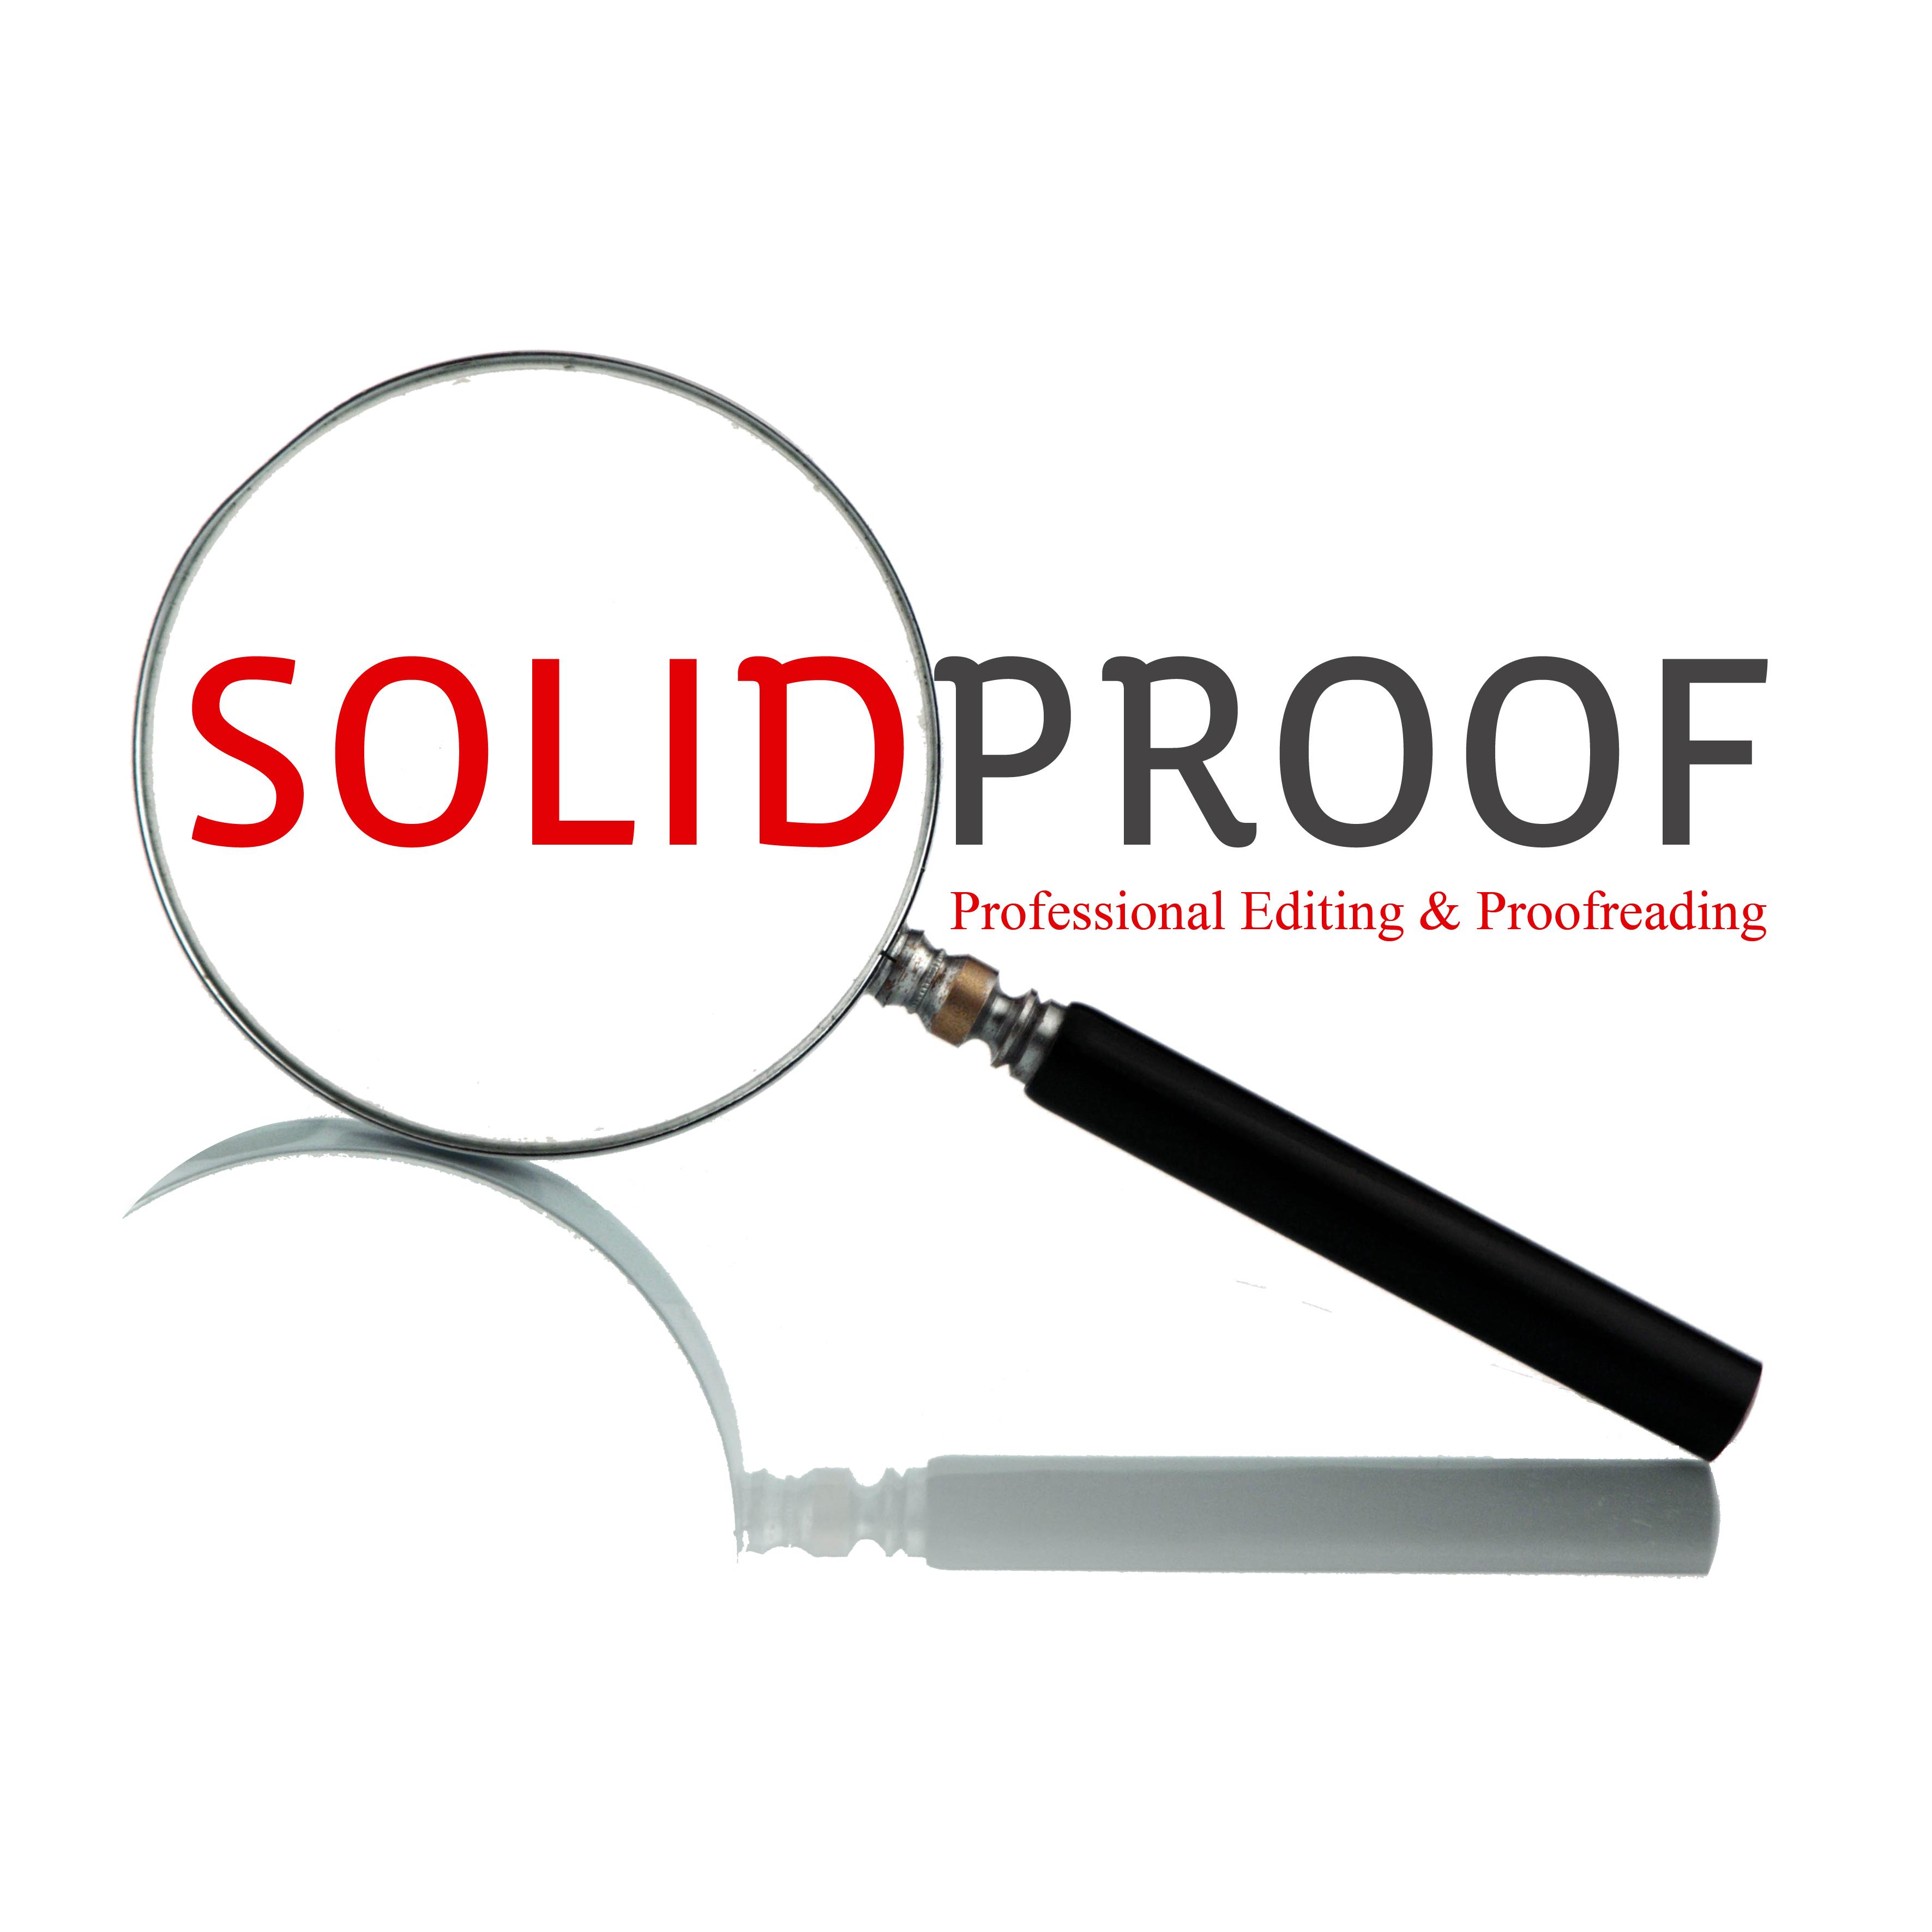 Solidproof FB Profile.jpg